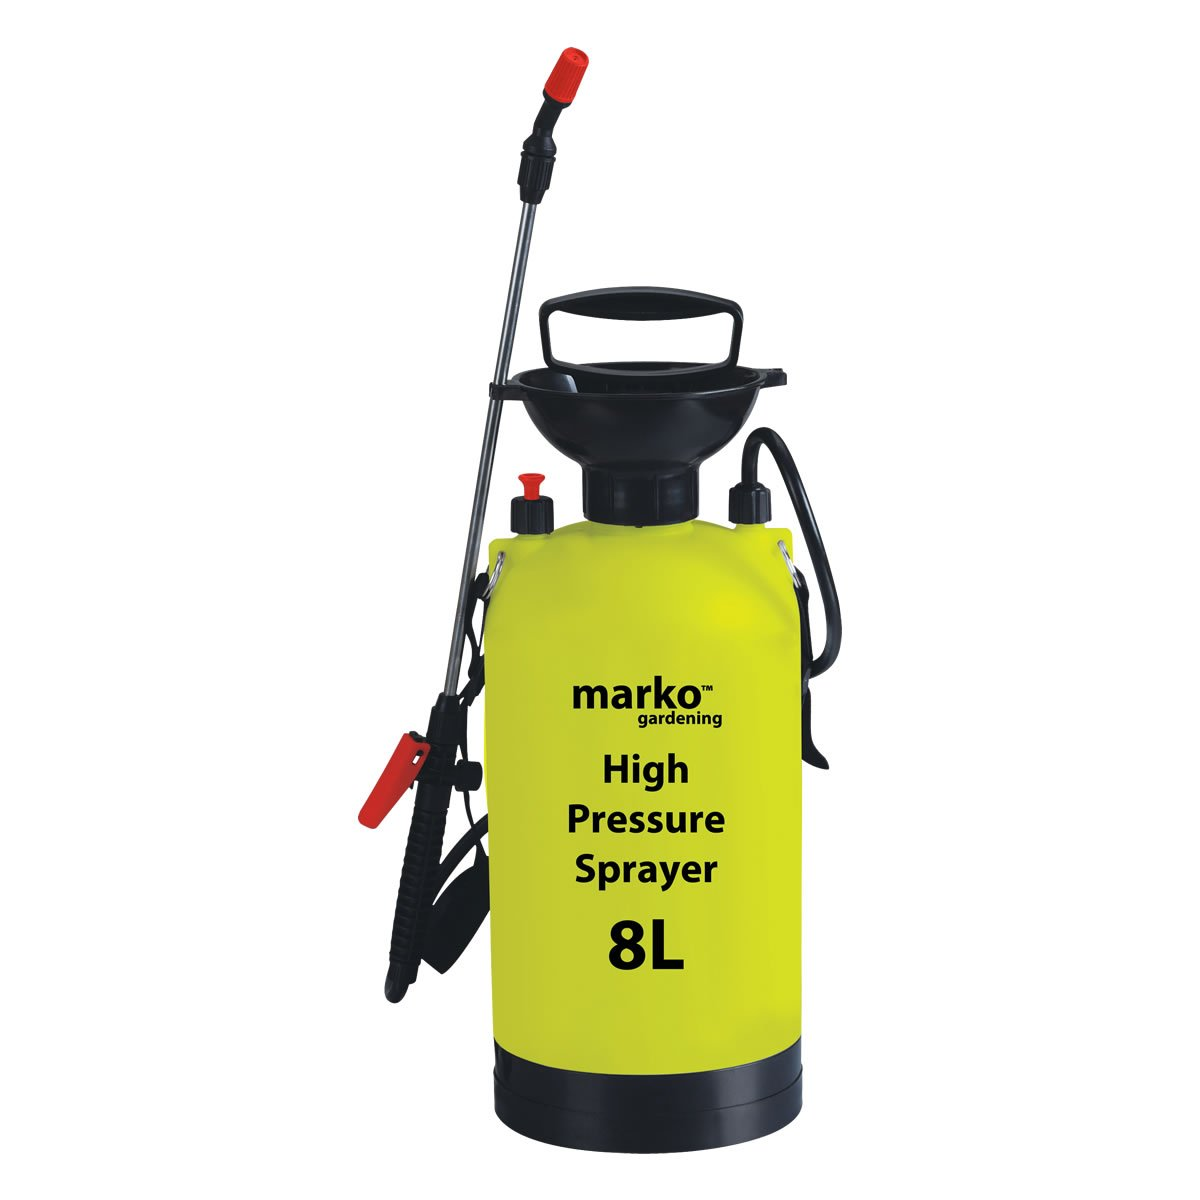 8L Litre Manual High Pressure Sprayer Bottle Knapsack Spray Weed Killer Garden Marko